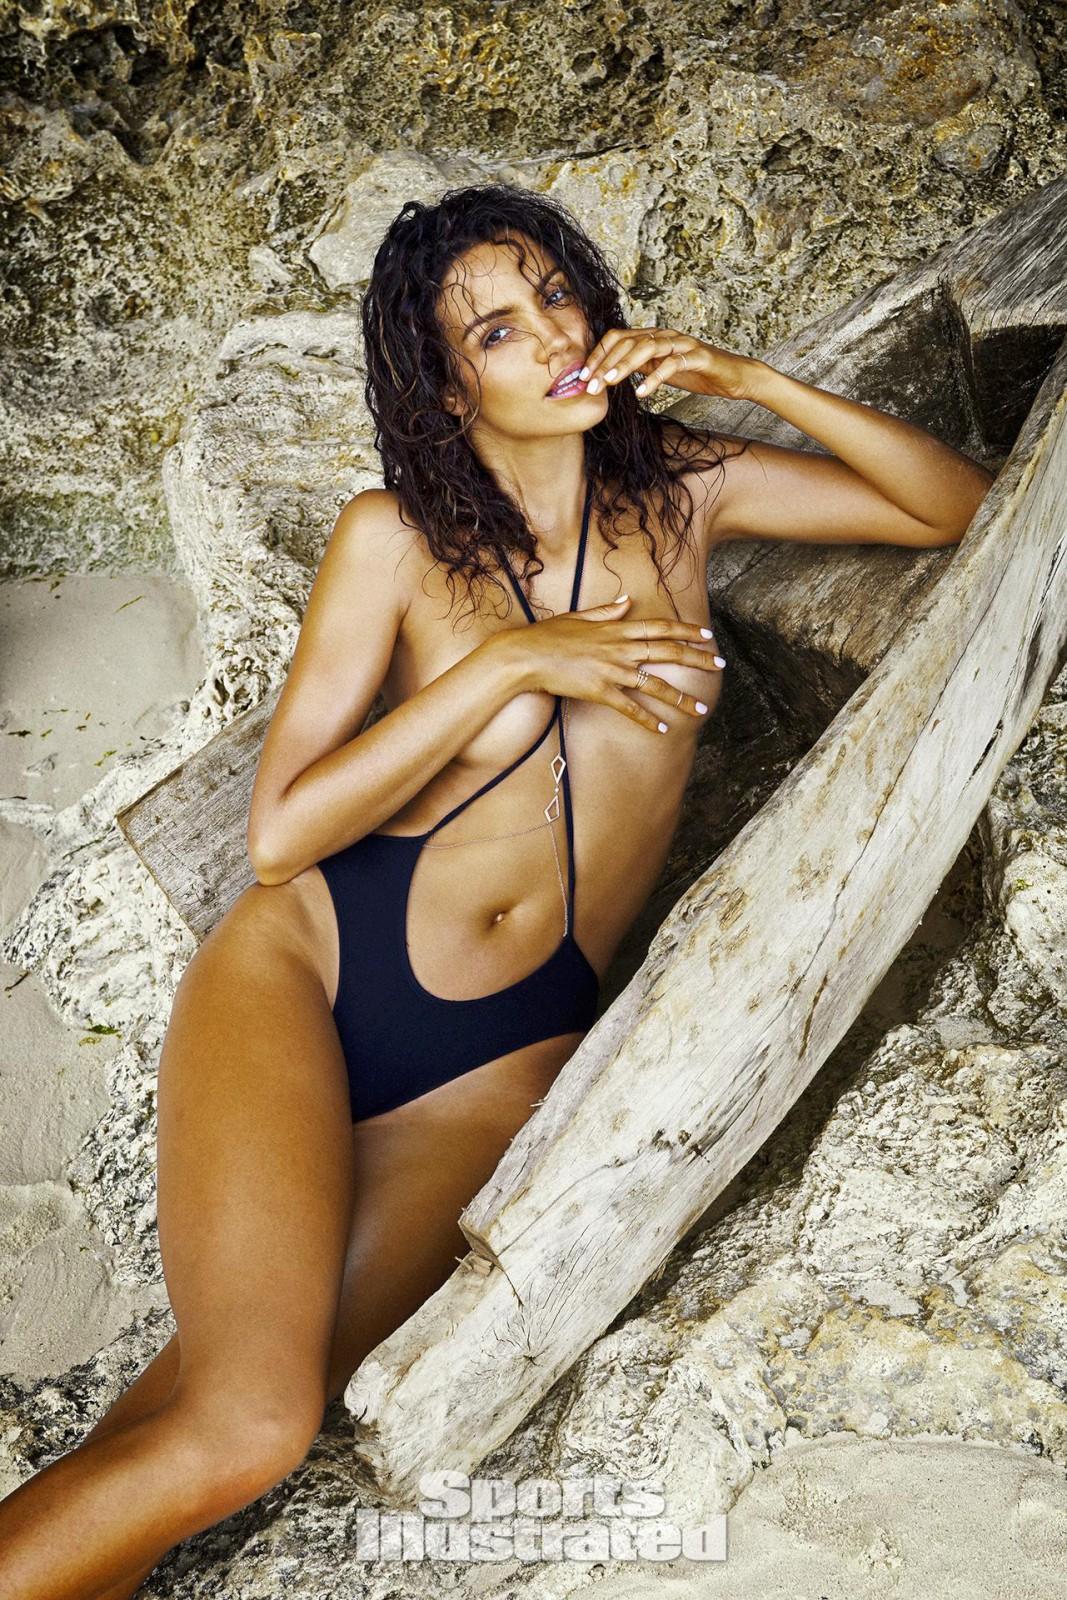 AnnaLynne McCord Attention Whores At The Beach,Paparazzi photos Erotic pics Dree hemingway sexy,Leaked pics of masika kalysha